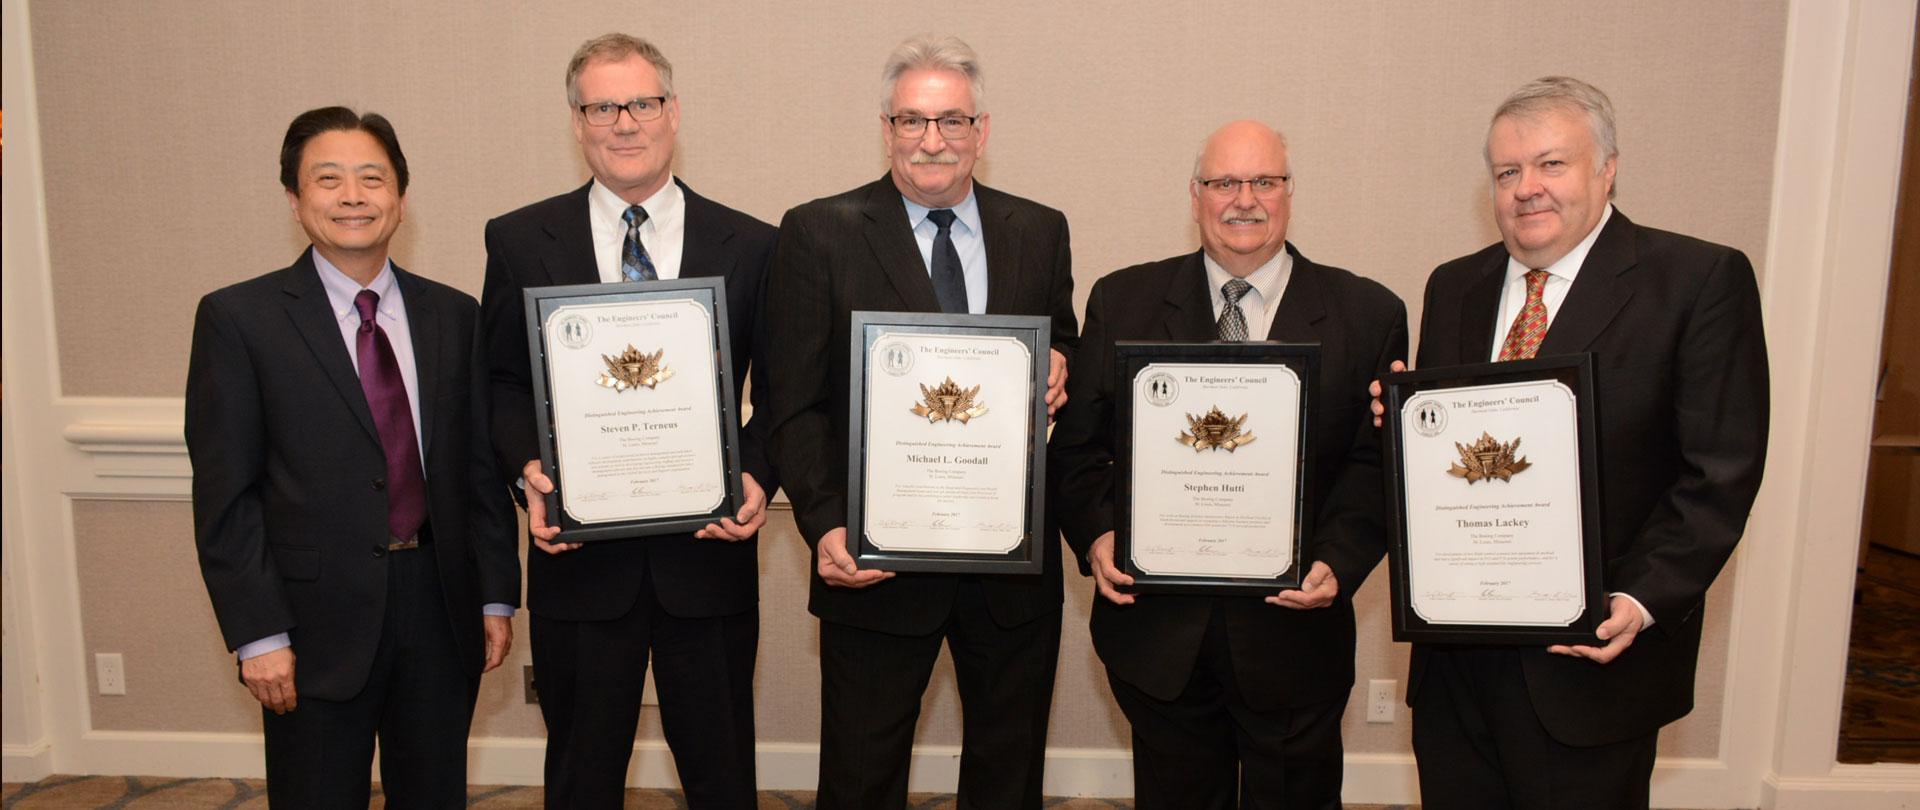 2017 Distinguished Engineering Achievement Award Winners